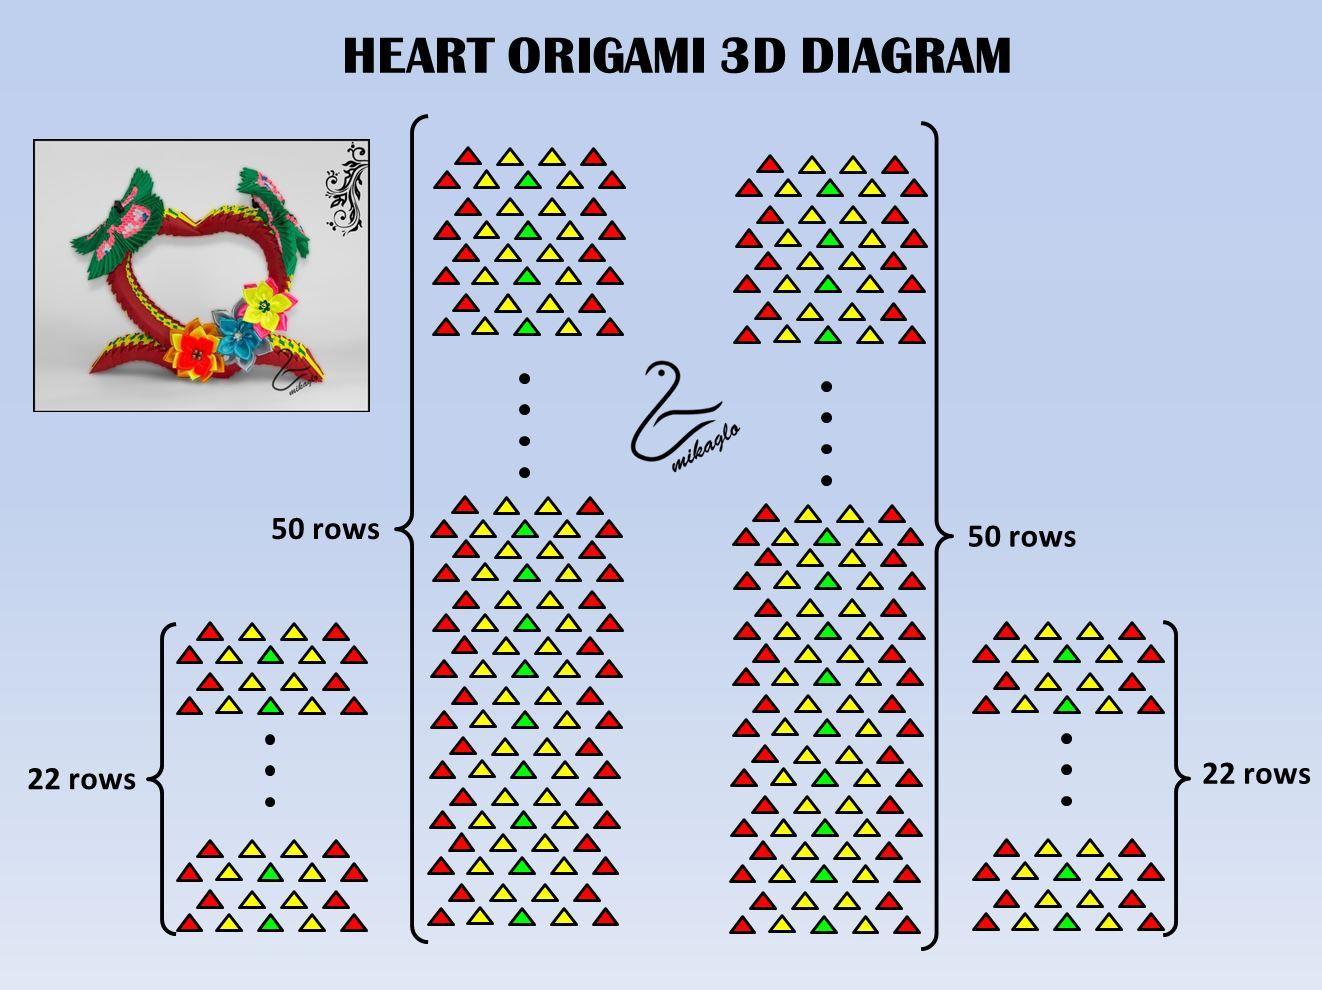 3d origami diagram animals virago 920 wiring patterns google zoeken used